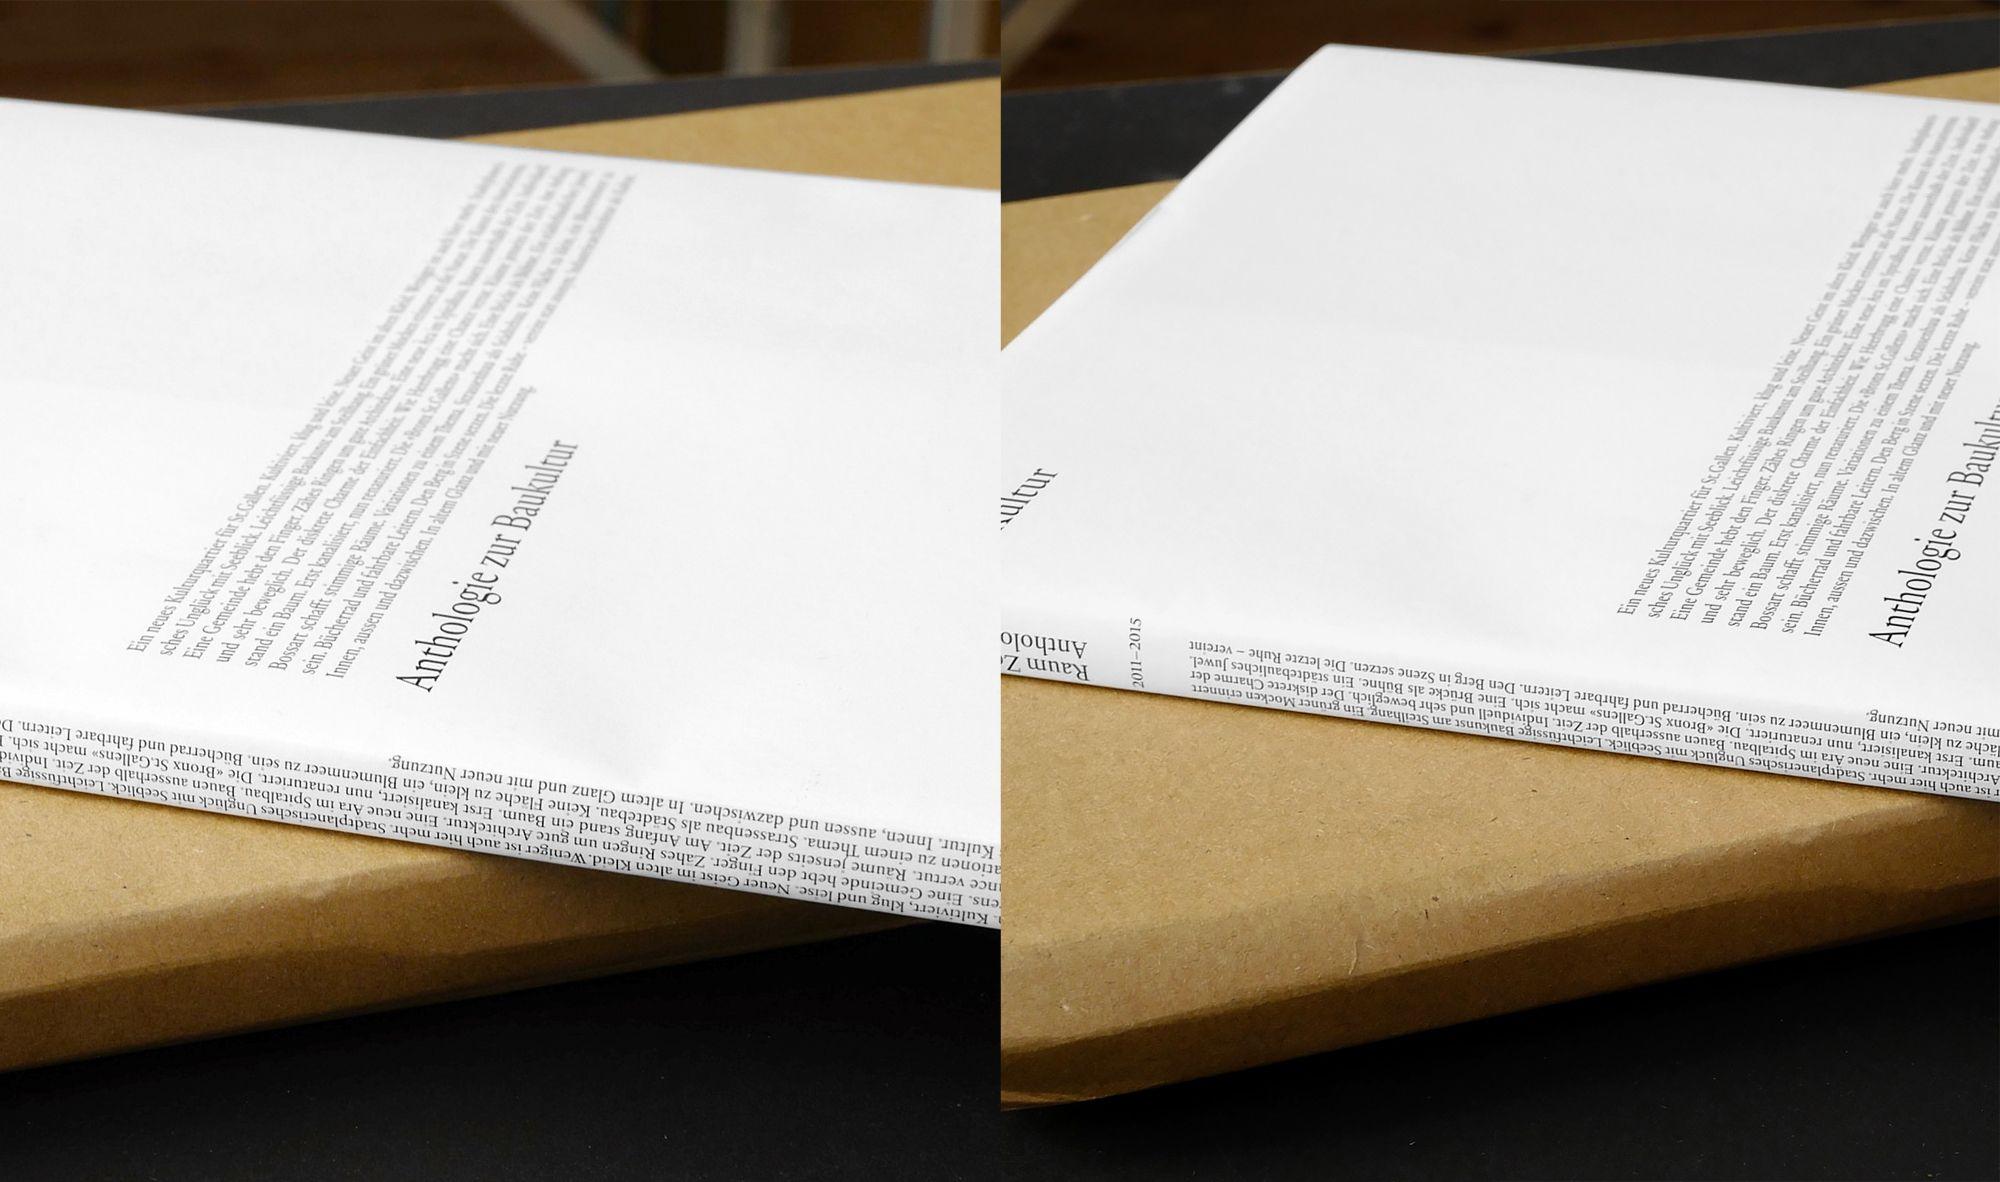 Bänziger Hug   COVERS   Pinterest   Hug, Interactive design and ...